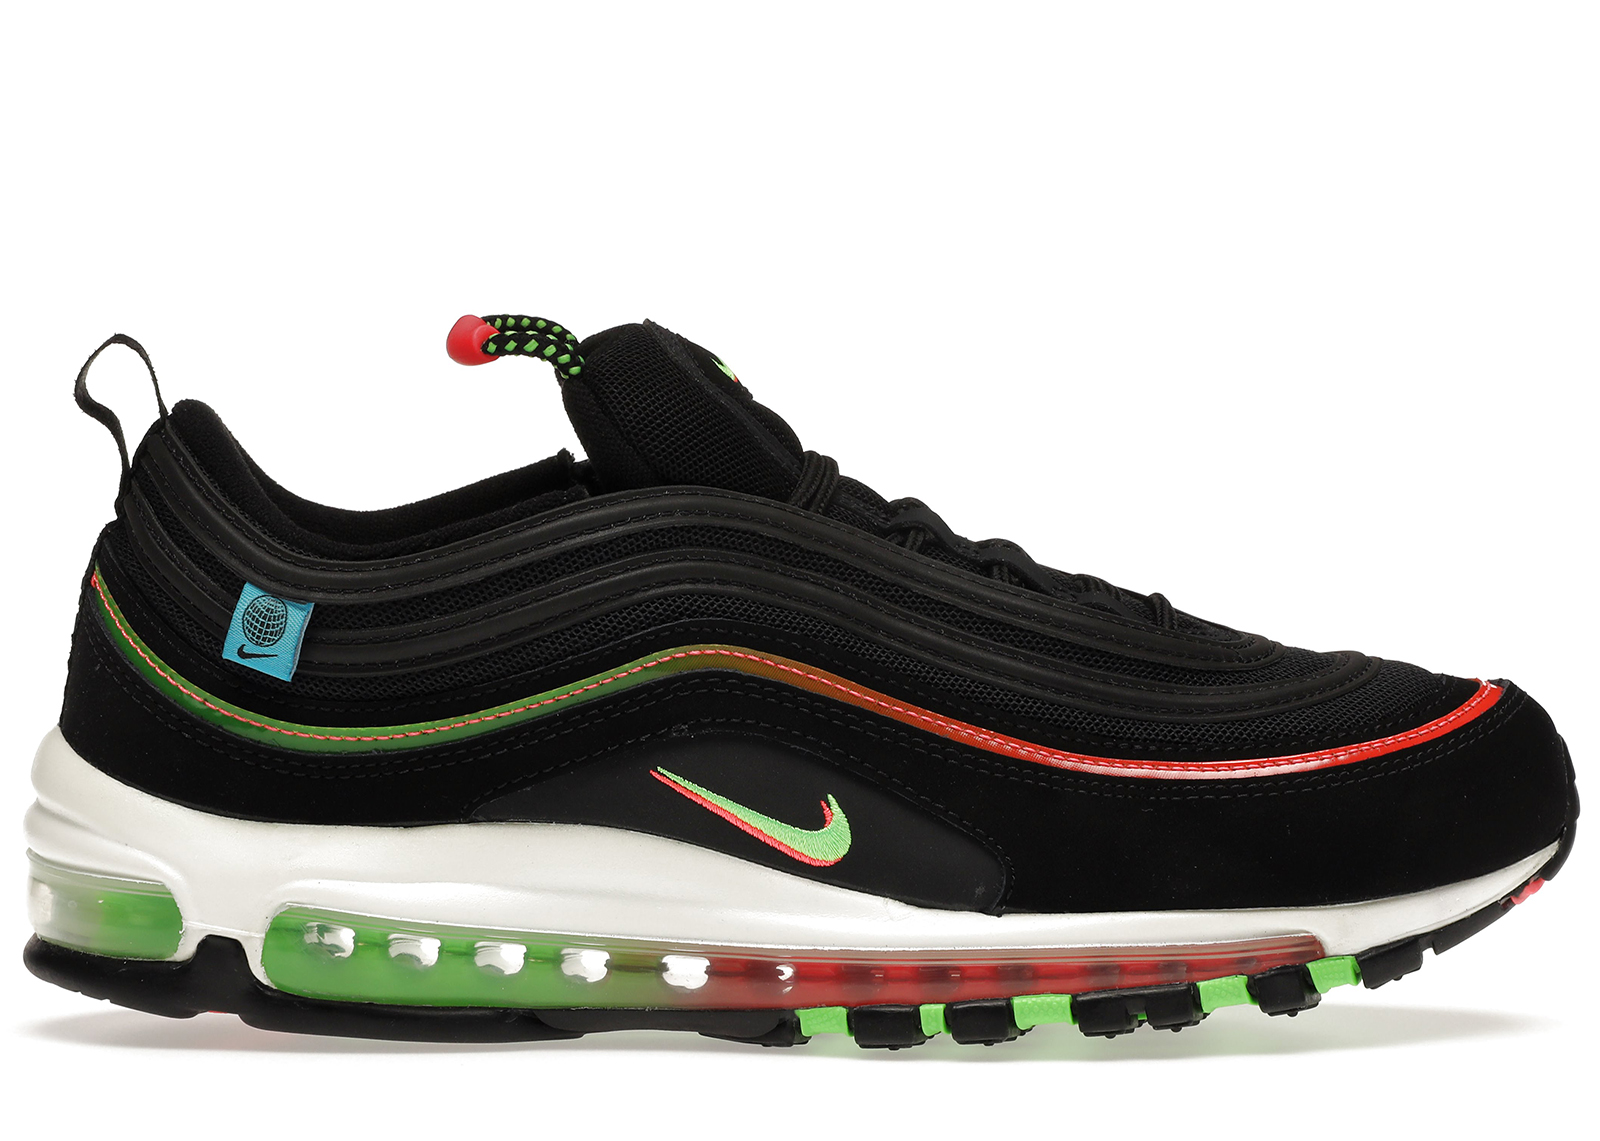 Nike Air Max 97 Worldwide Black